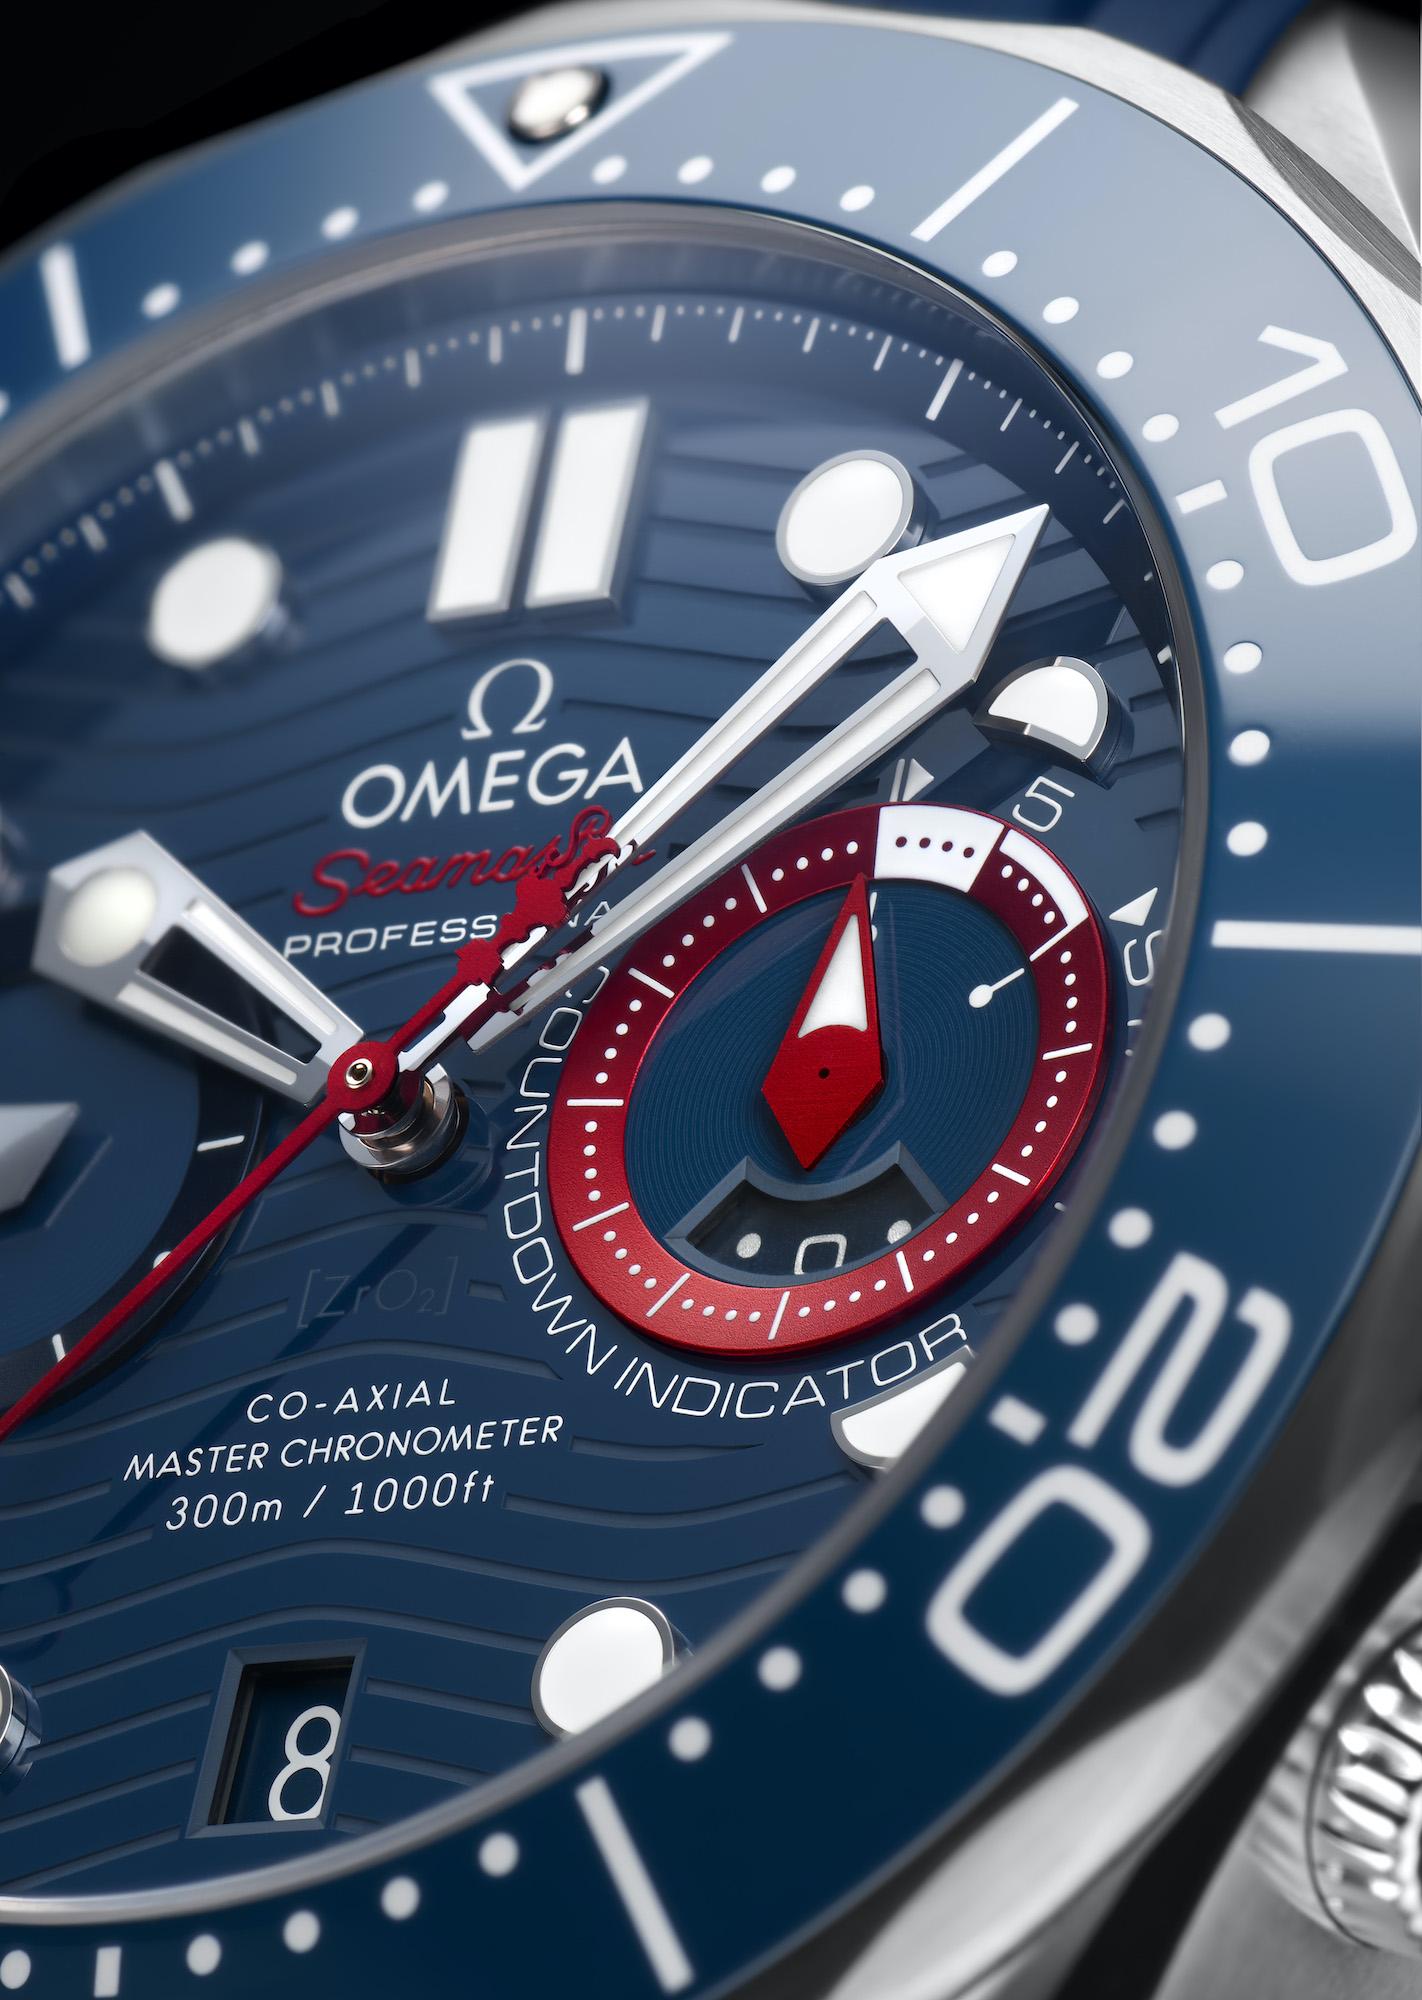 Omega Seamaster Diver 300M Americas Cup Chronograph 210.30.44.51.03.002 Detalle esfera